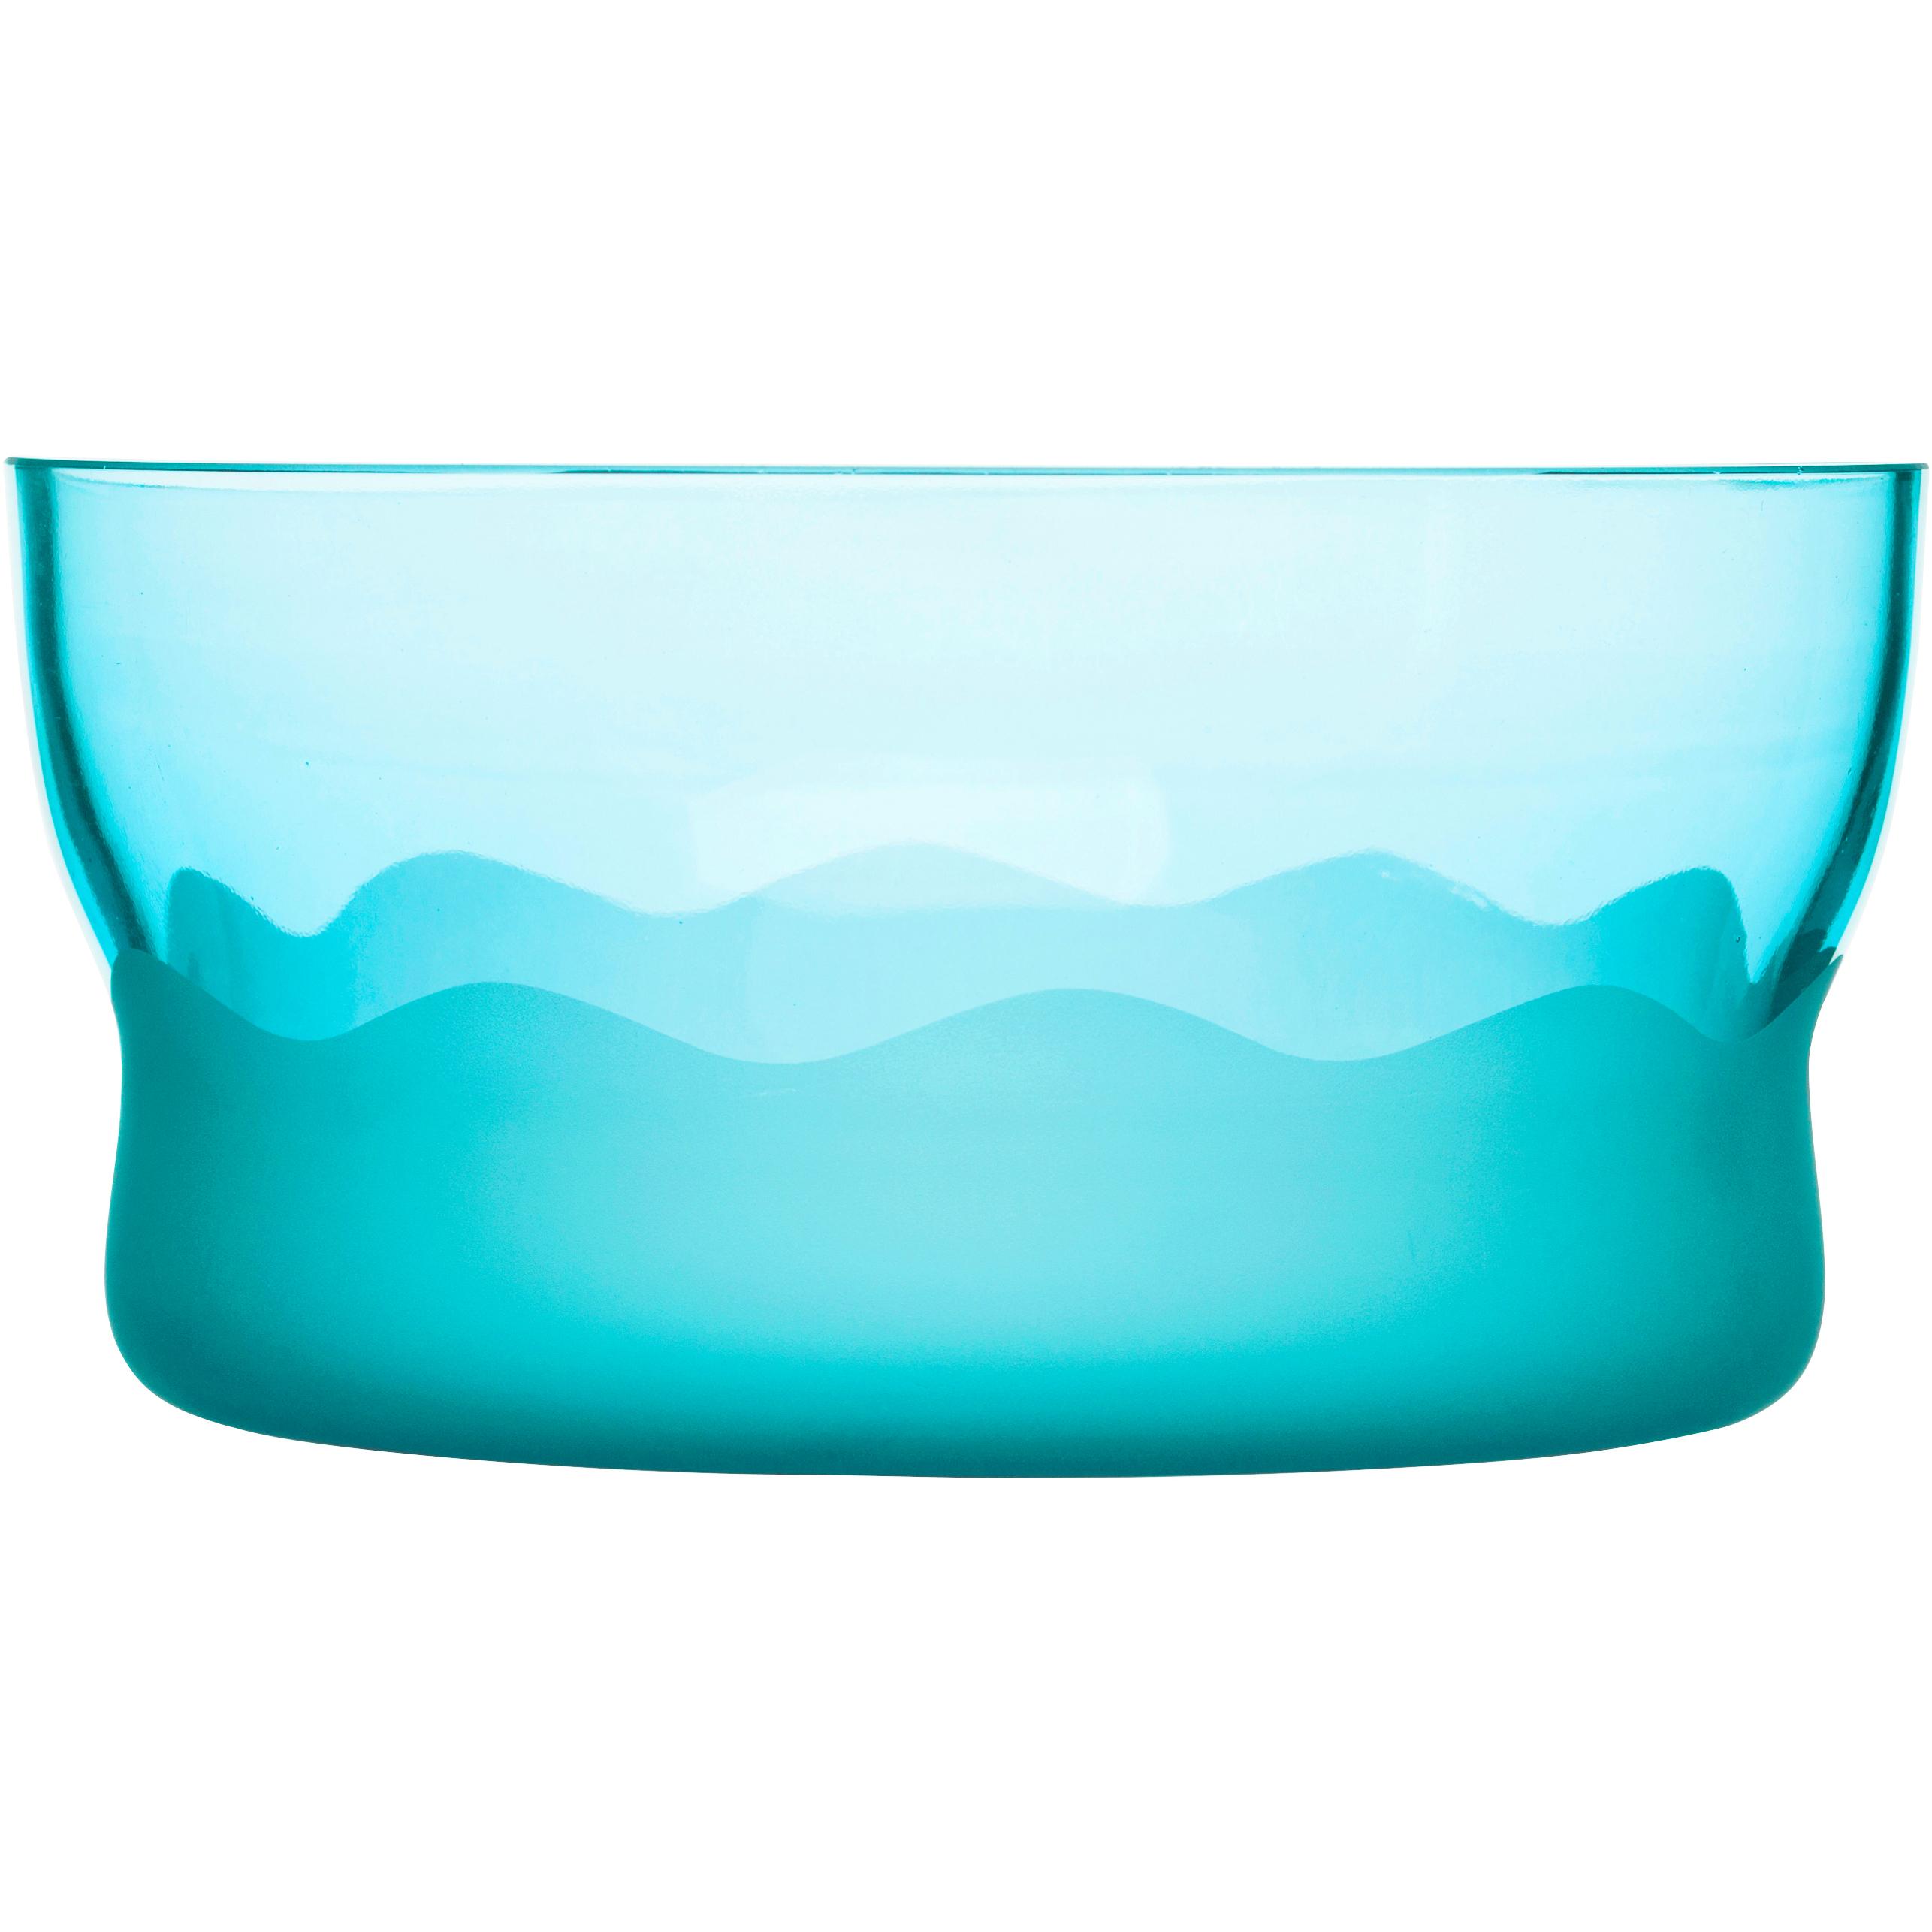 SEAglasbruk Aqua Wave Turquoise Glass Serving Bowl